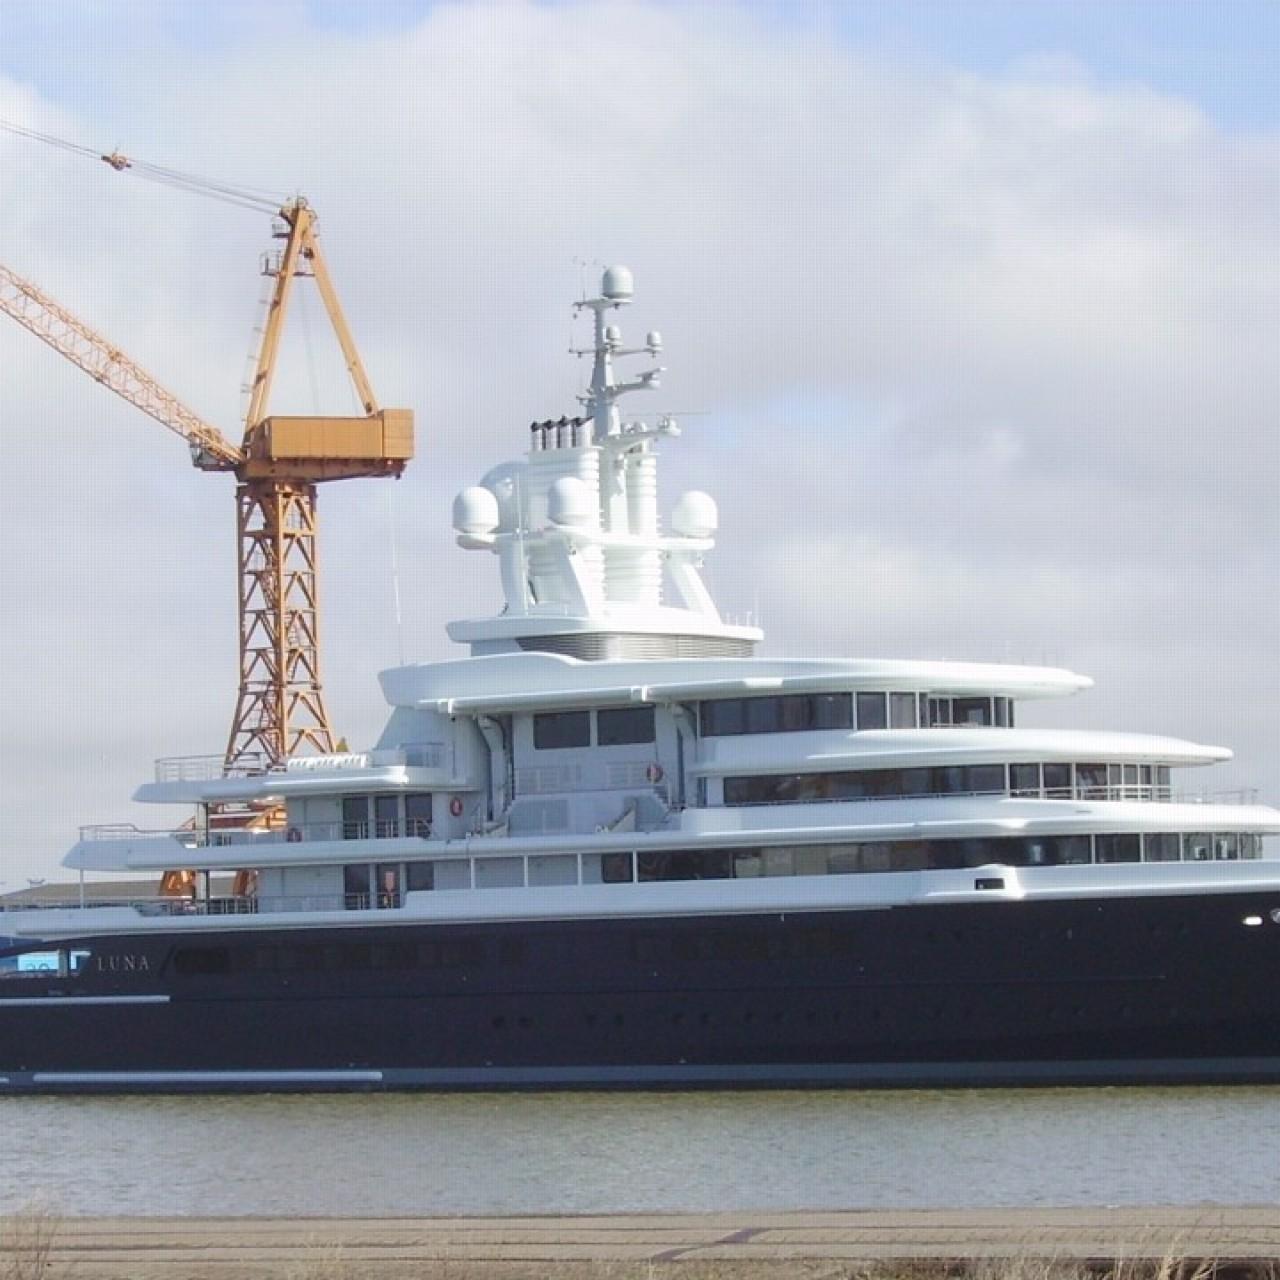 Russian Billionaire Farkhad Akhmedov To Lose Us 492 Million Yacht In